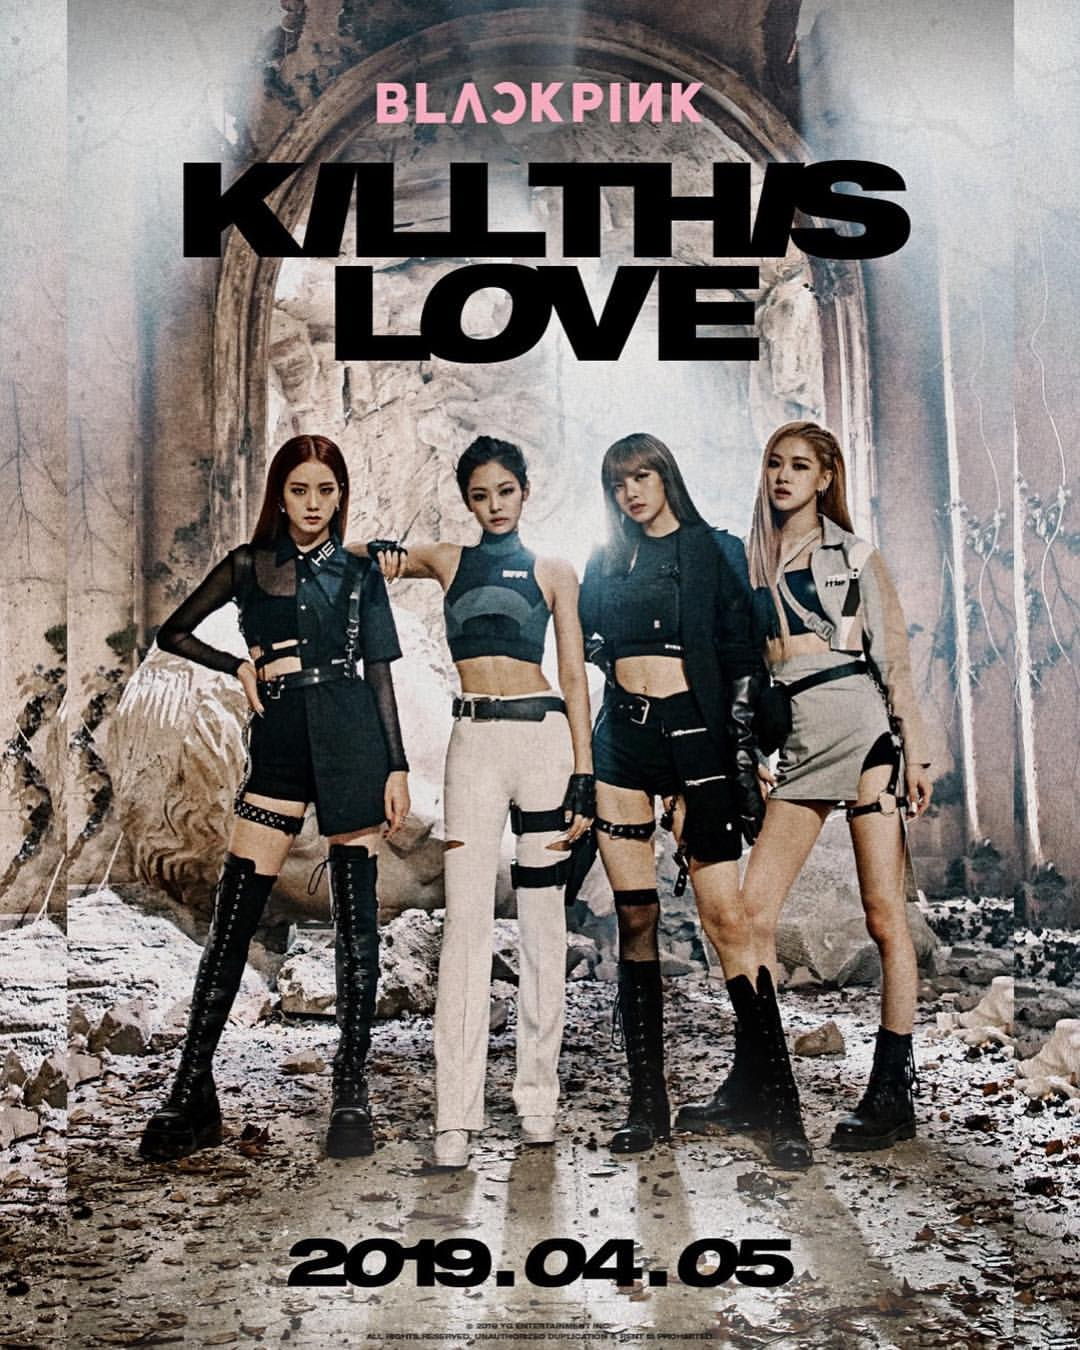 Blackpink Comeback Teaser Photos For Kill This Love